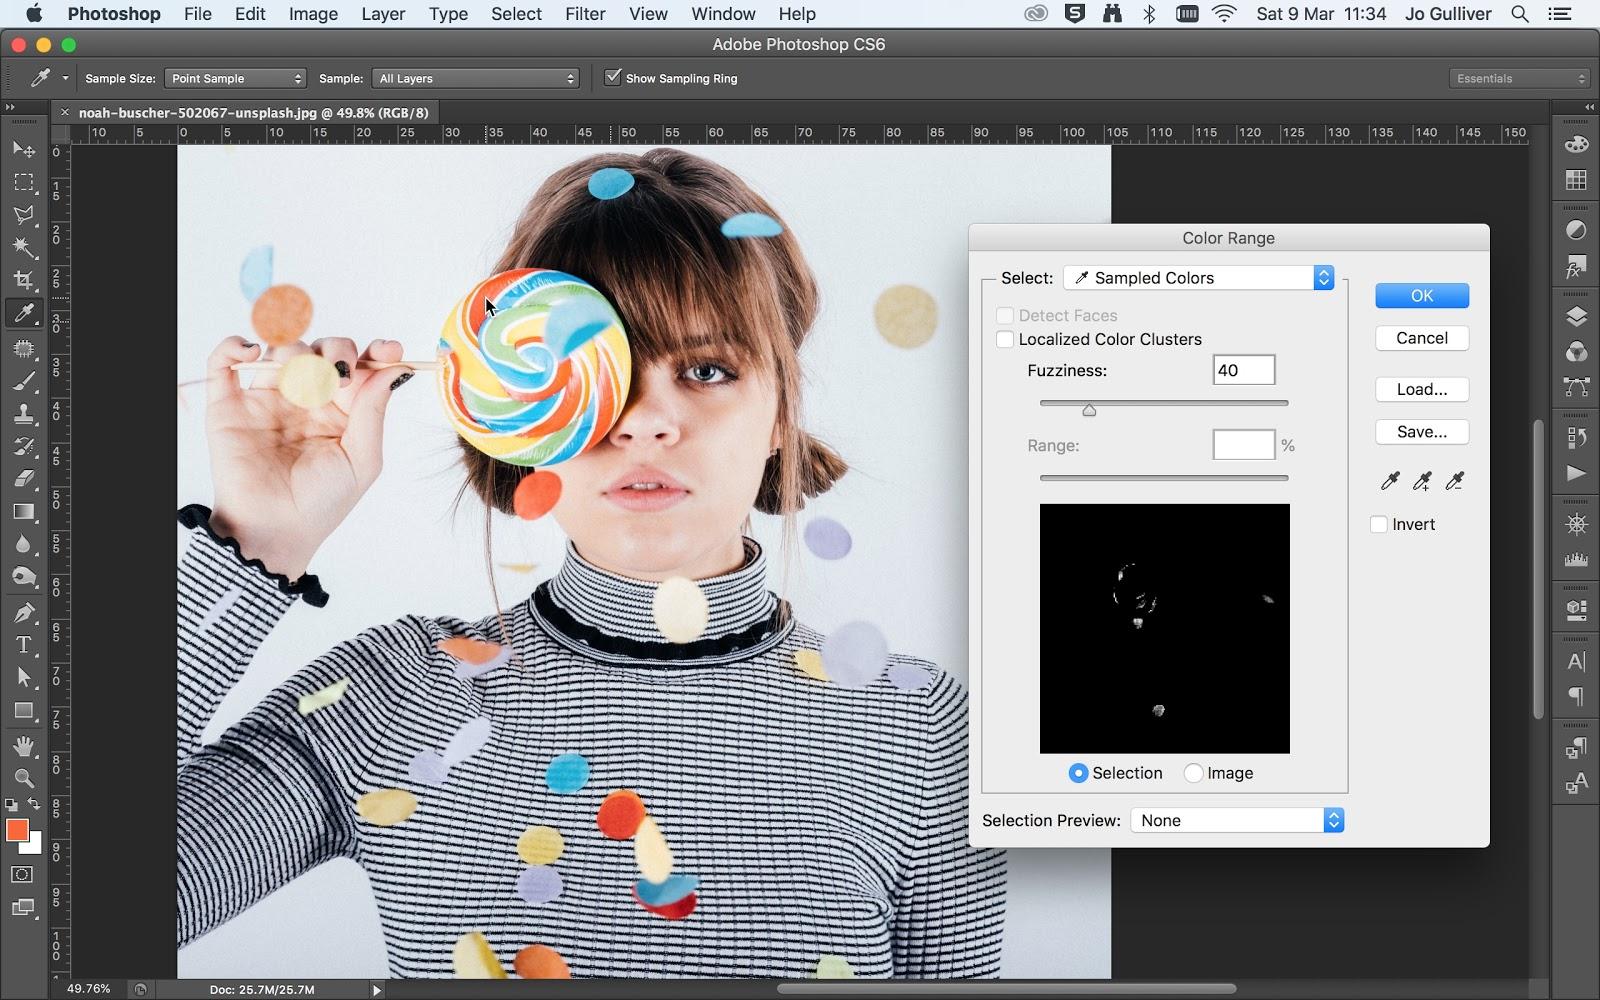 colour range tool in Photoshop